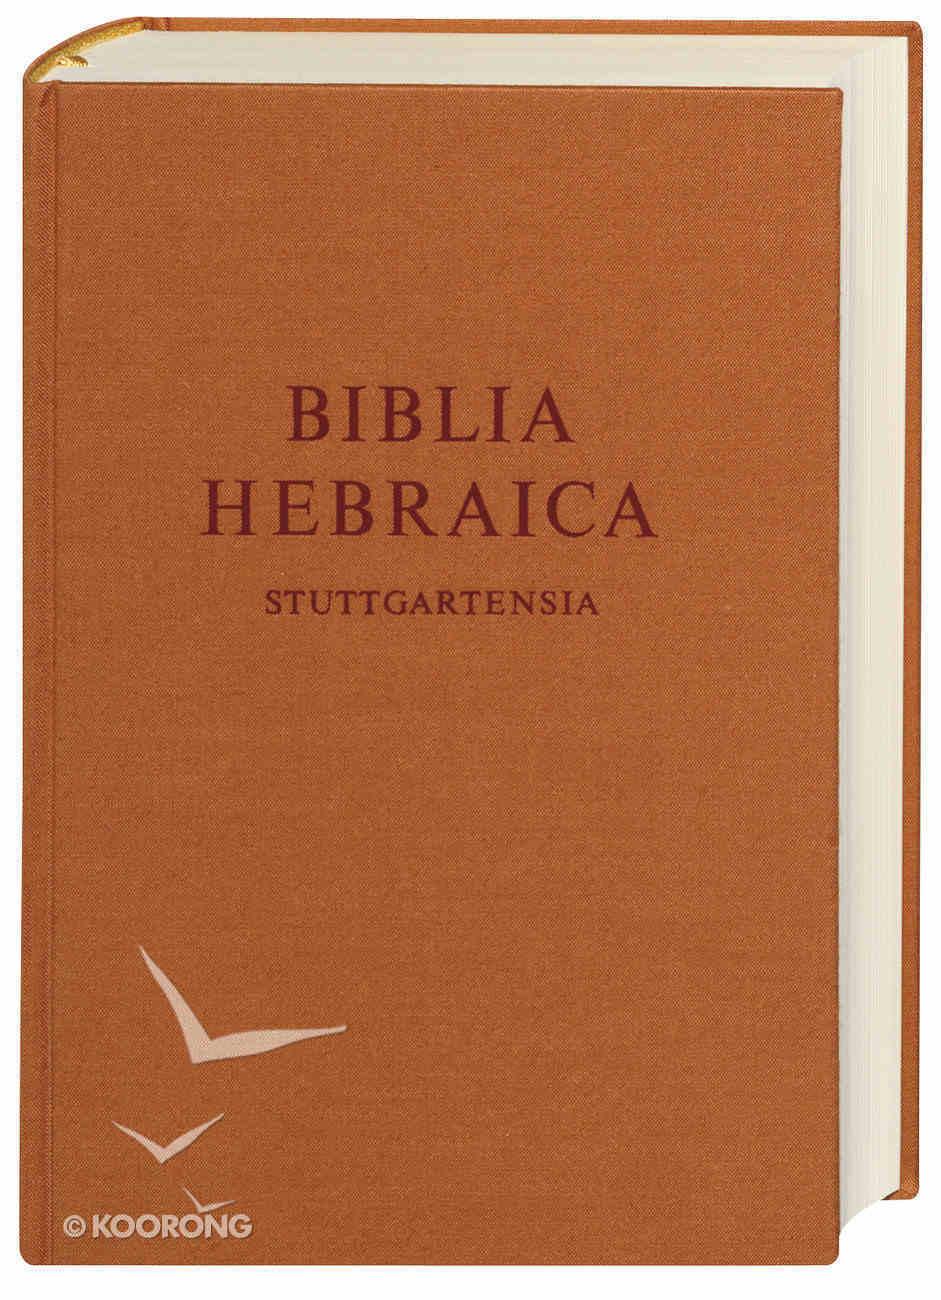 Biblia Hebraica Stuttgartensia Standard Edition (Brown) (Larger Size, Bigger Margins) Hardback